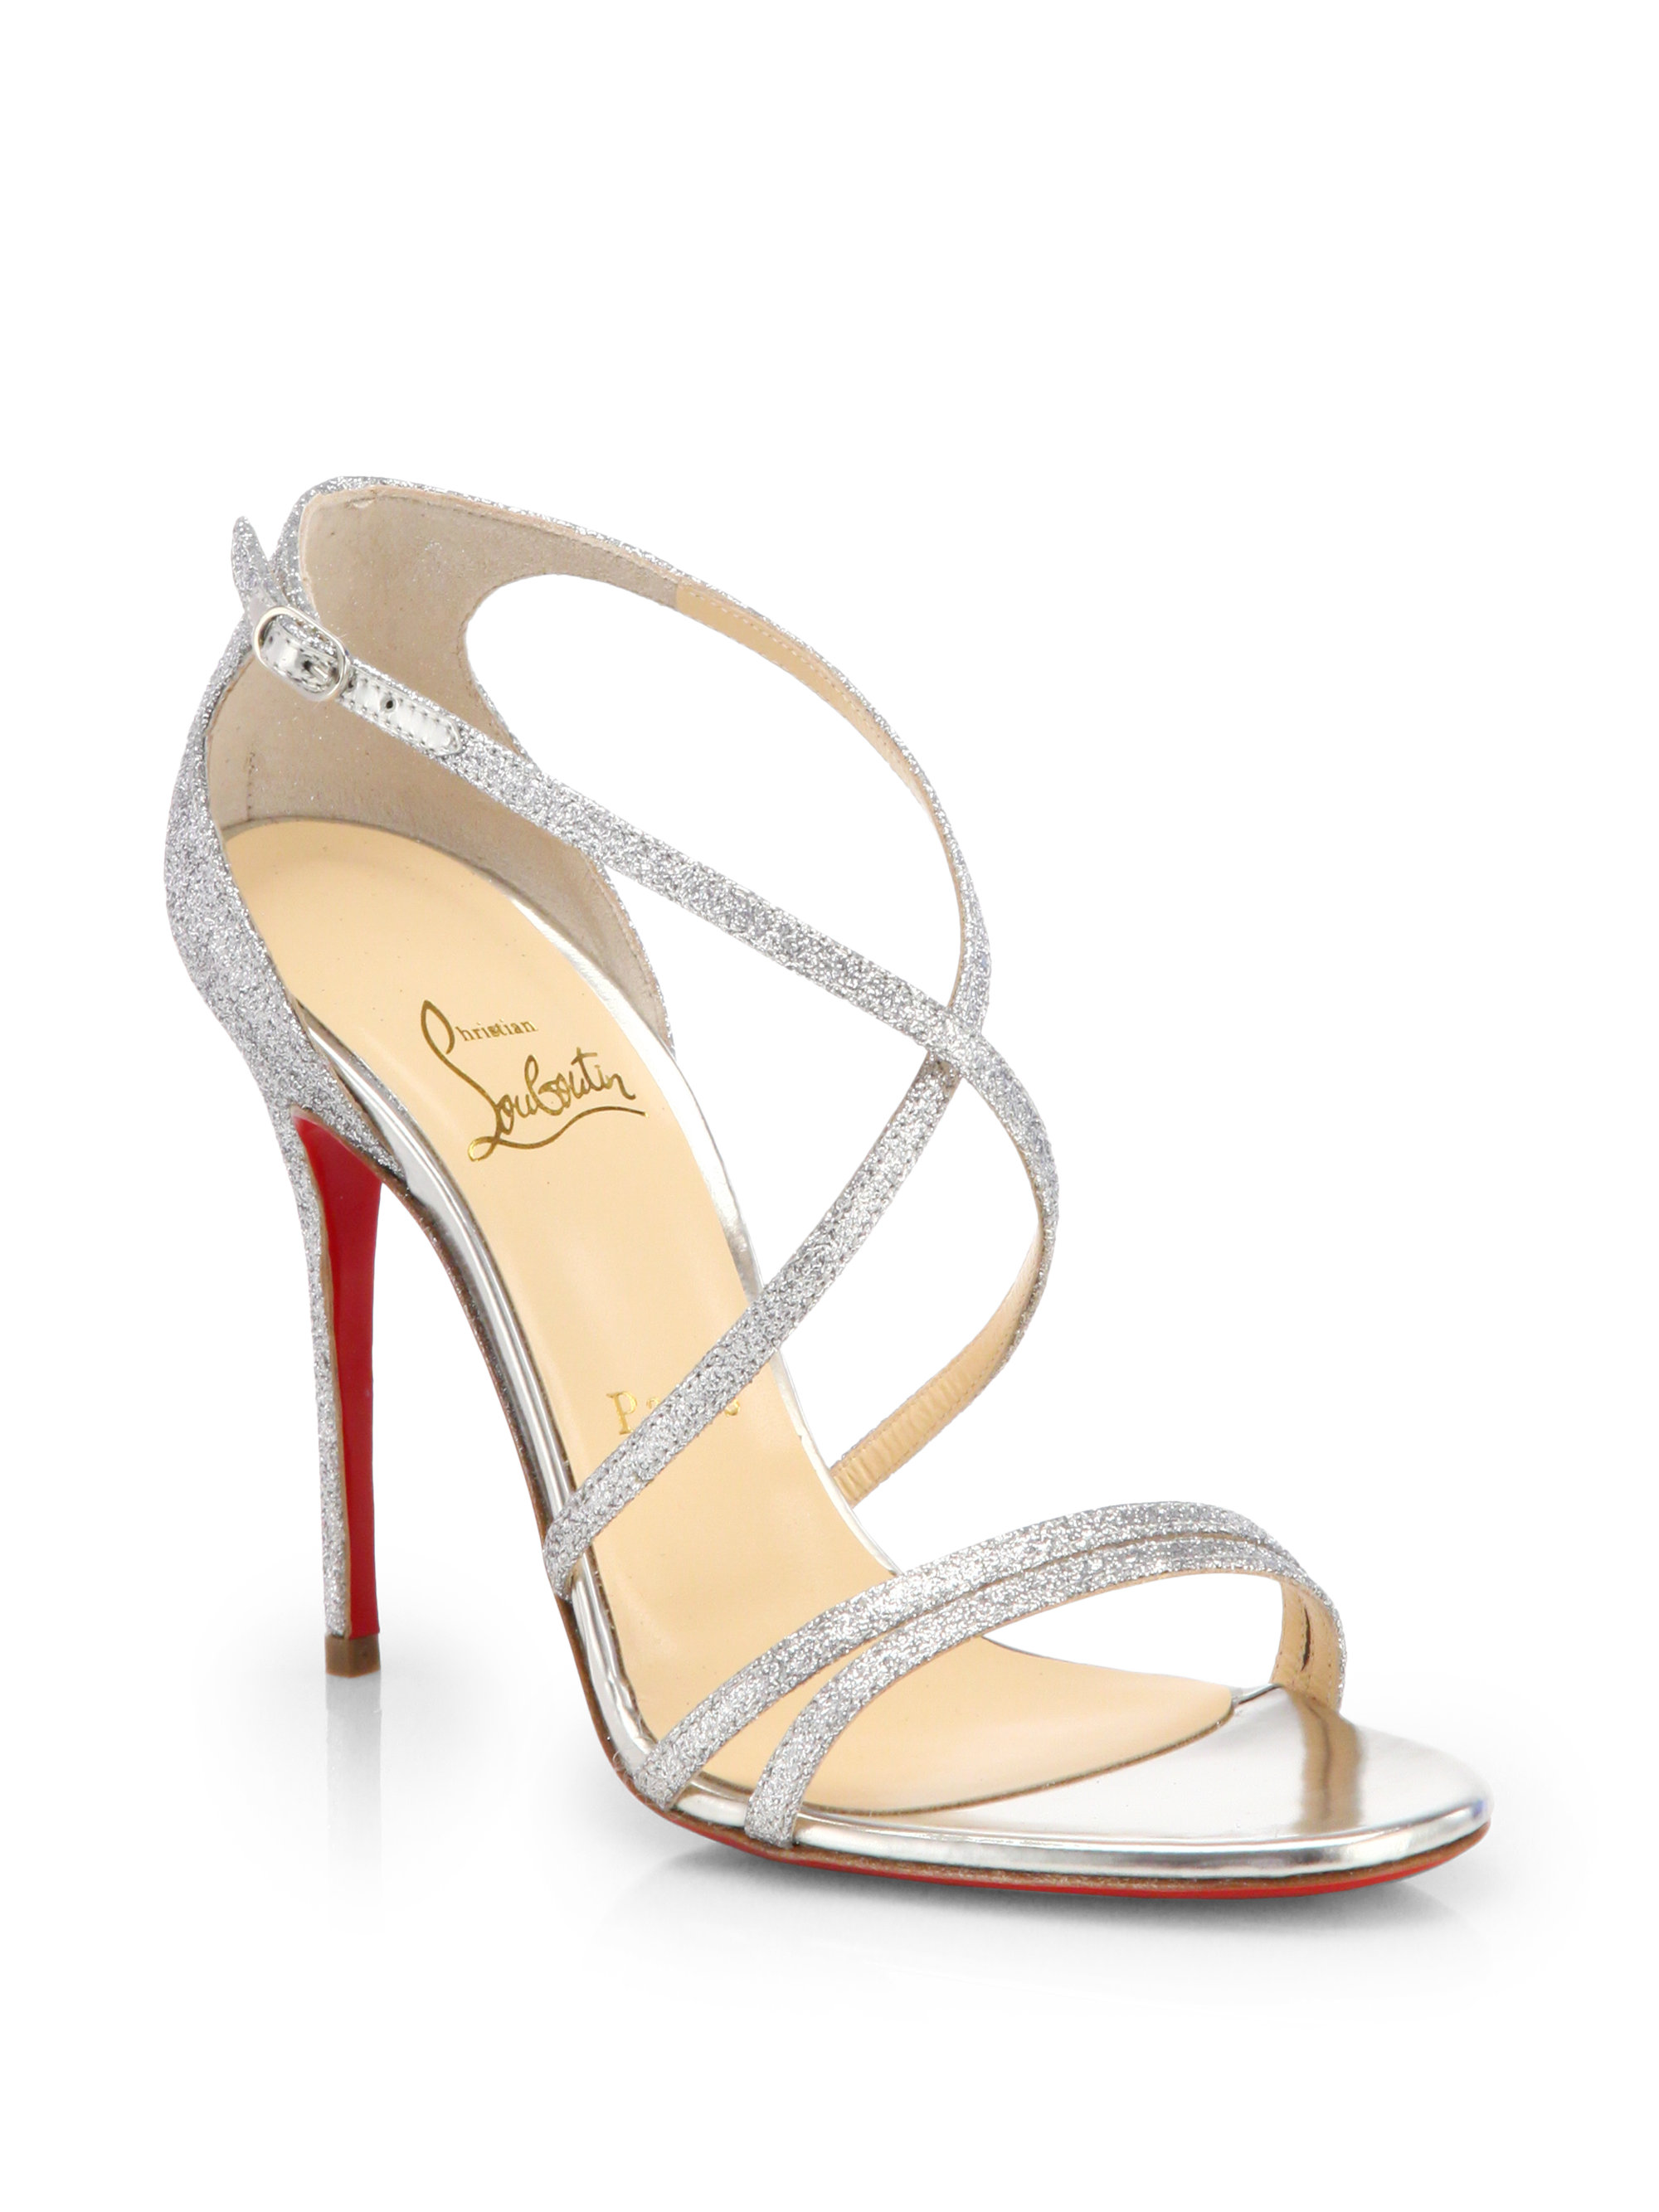 Sandals Louboutin